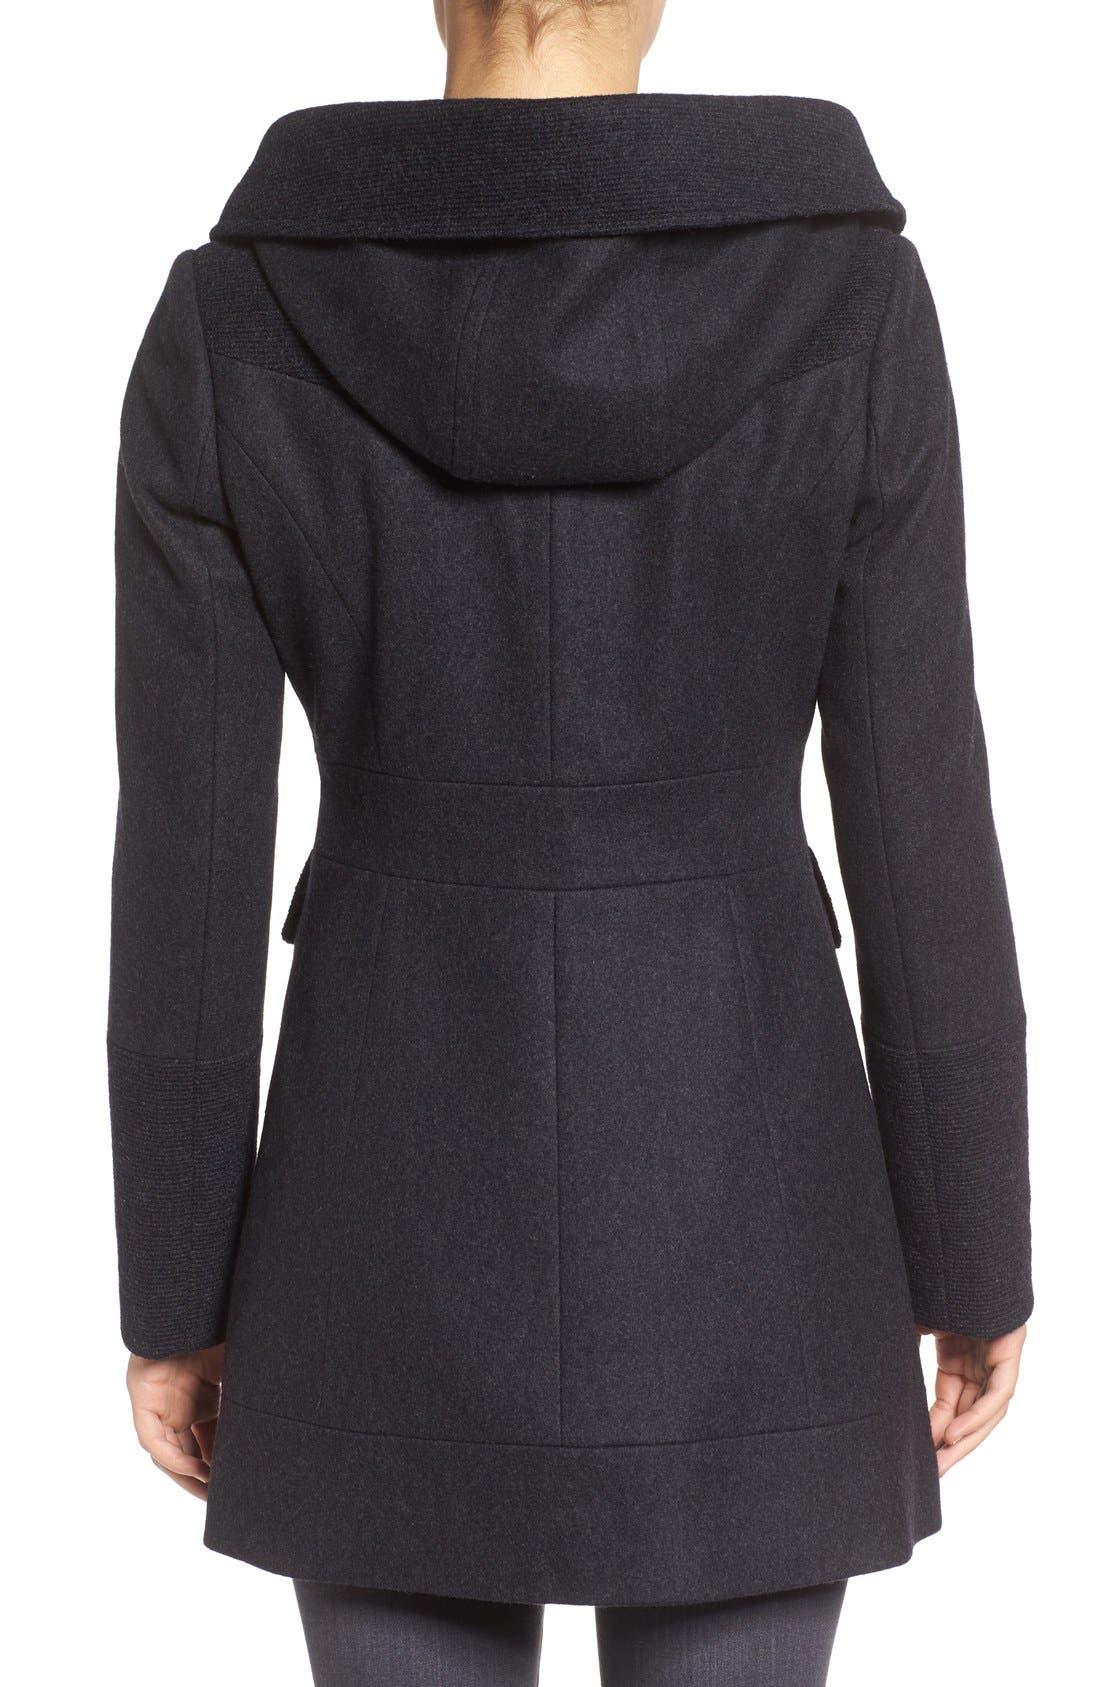 Wool Blend Hooded Coat,                             Alternate thumbnail 2, color,